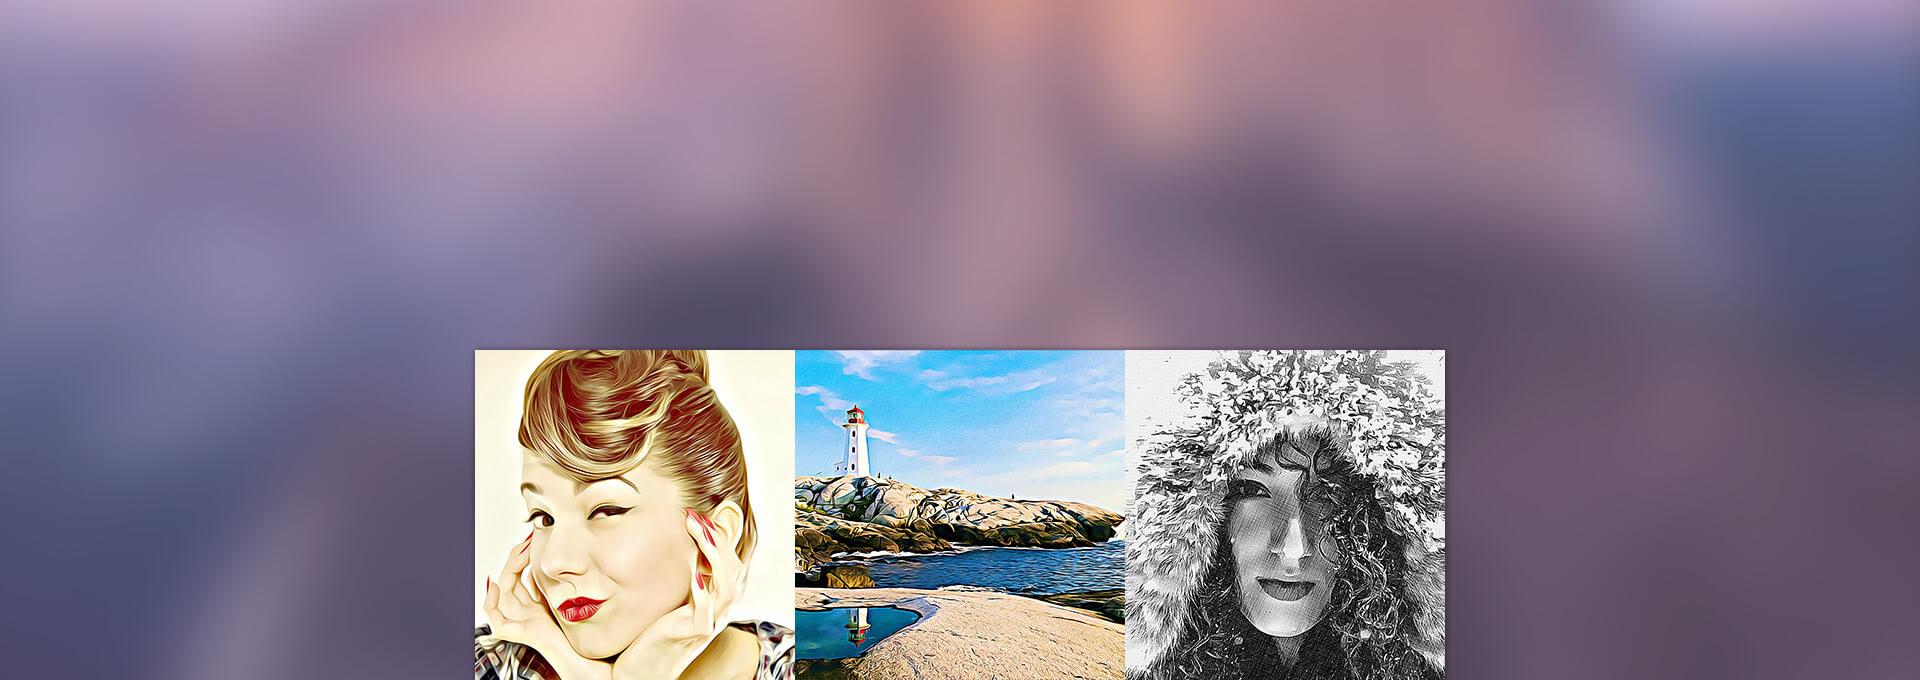 Desktop Photo Editing Tools - BeFunky